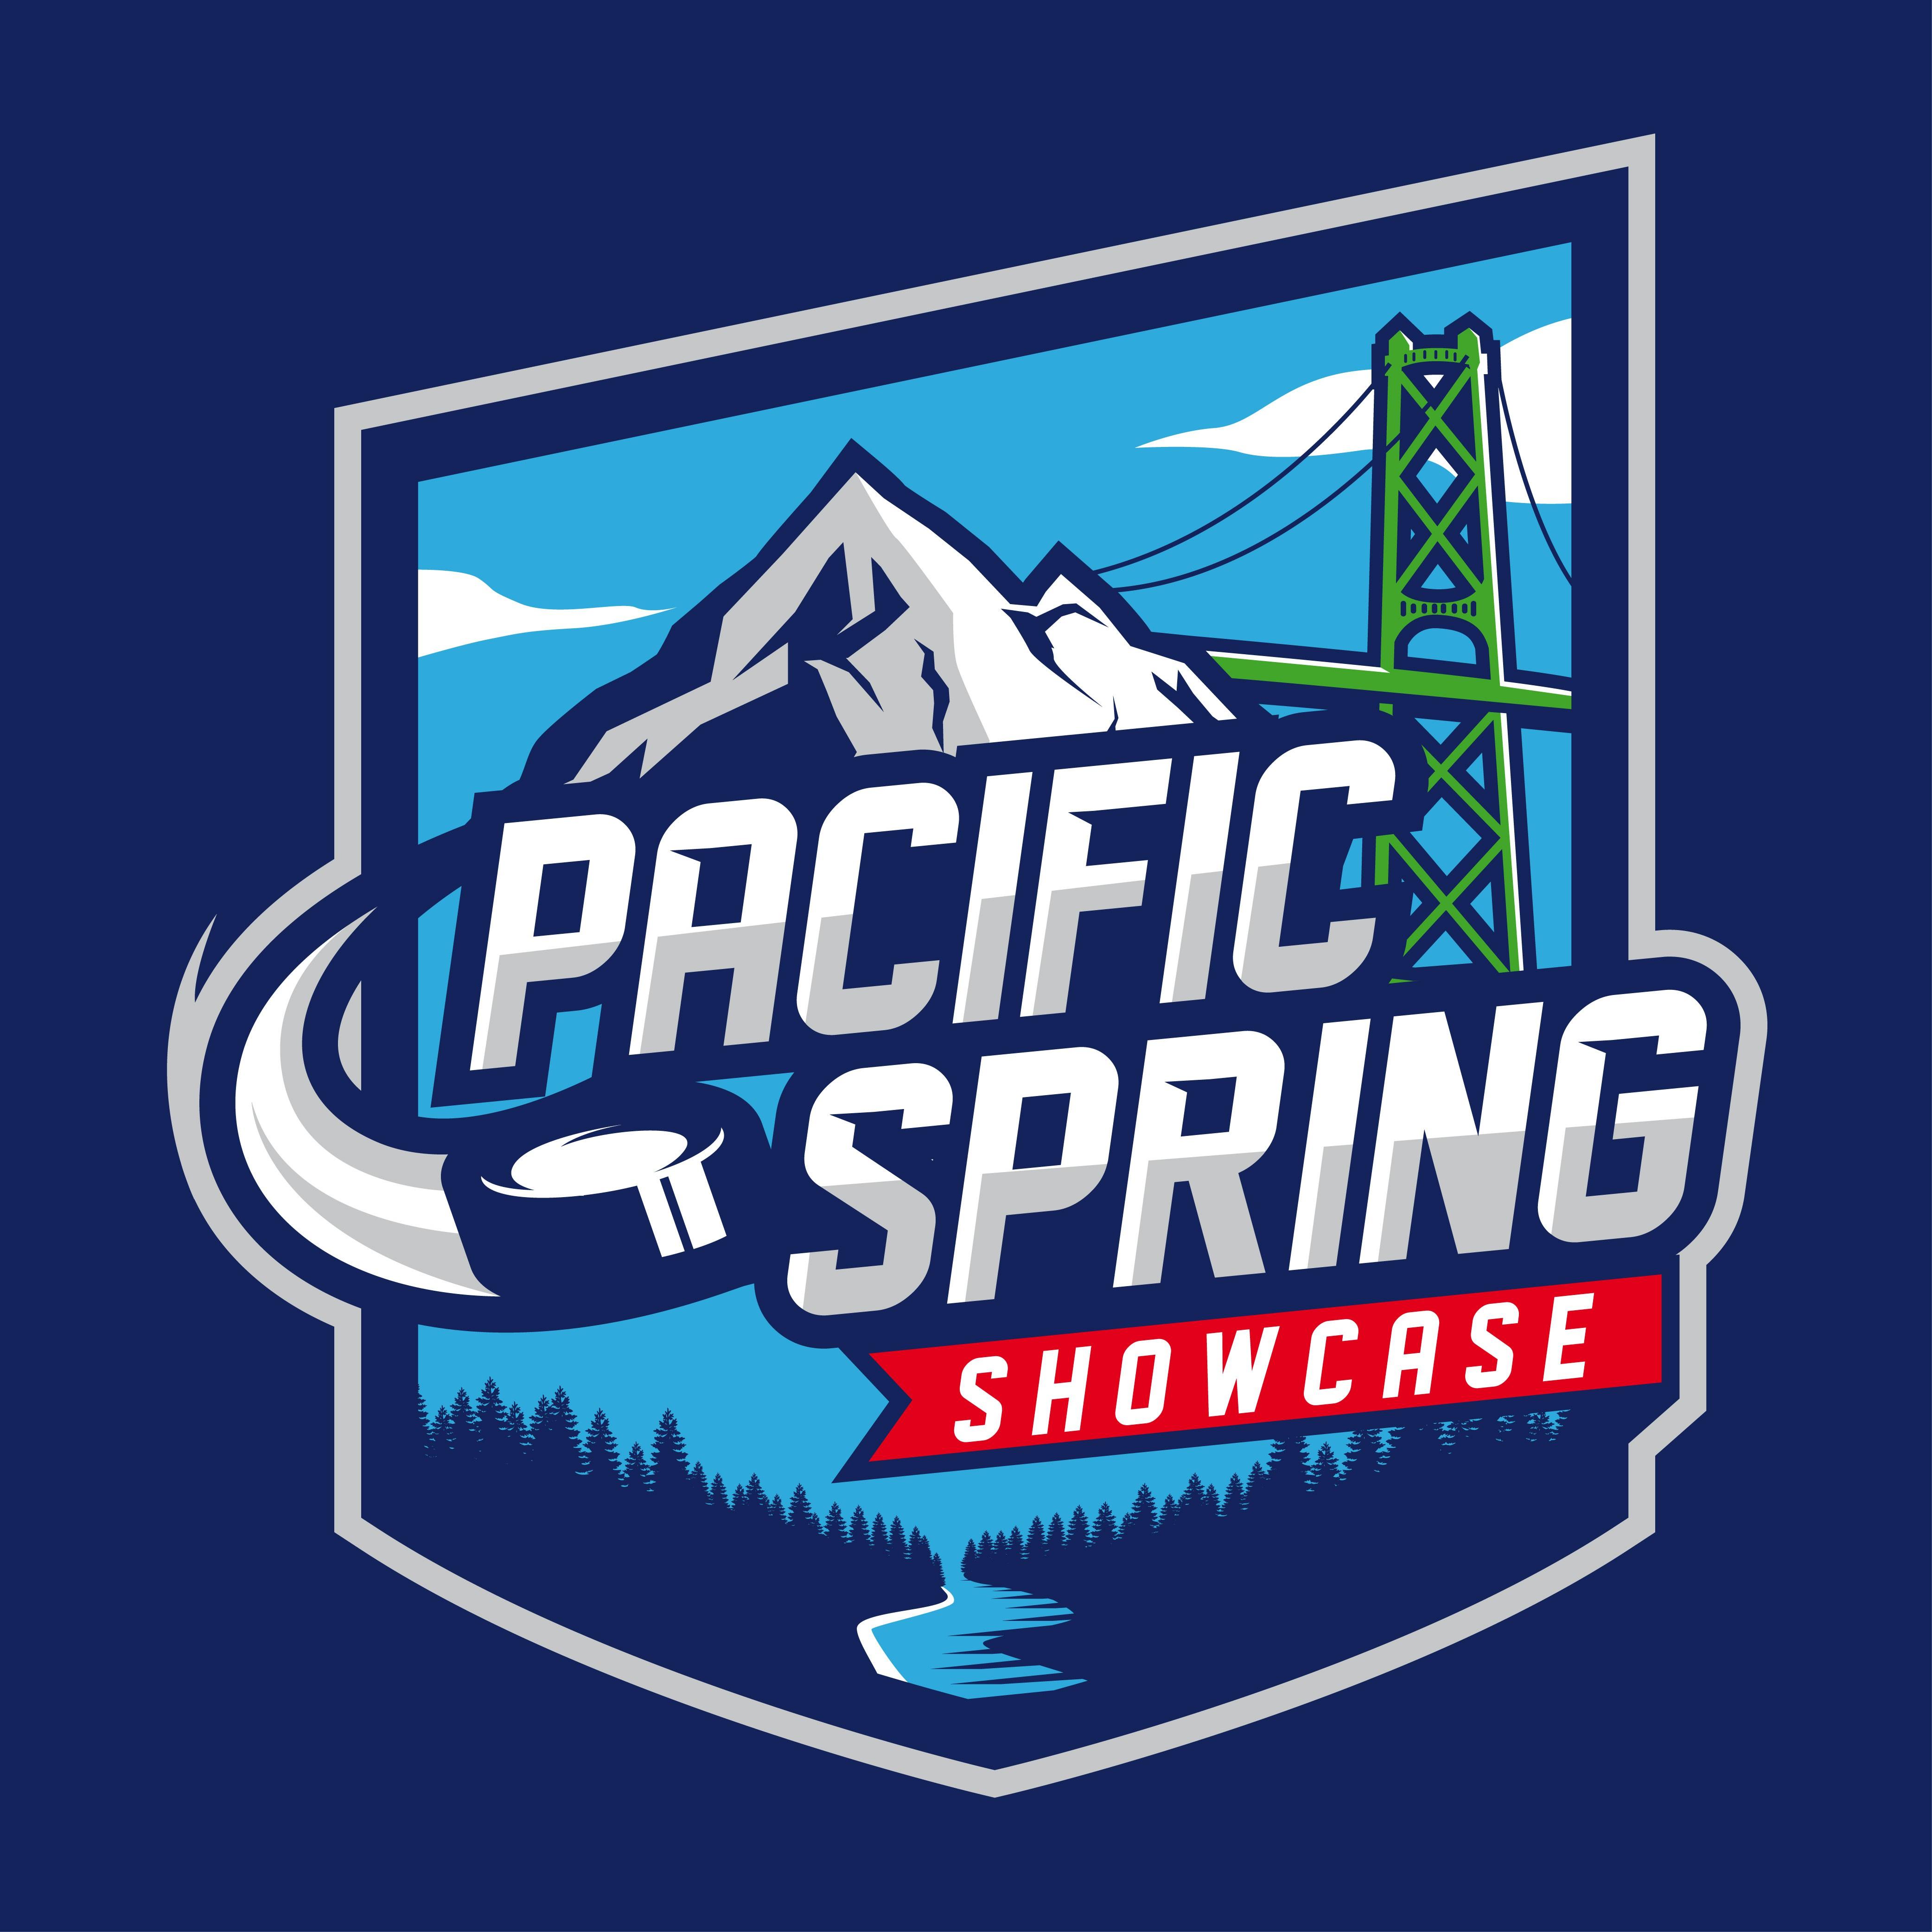 Pacific Spring Showcase Logo